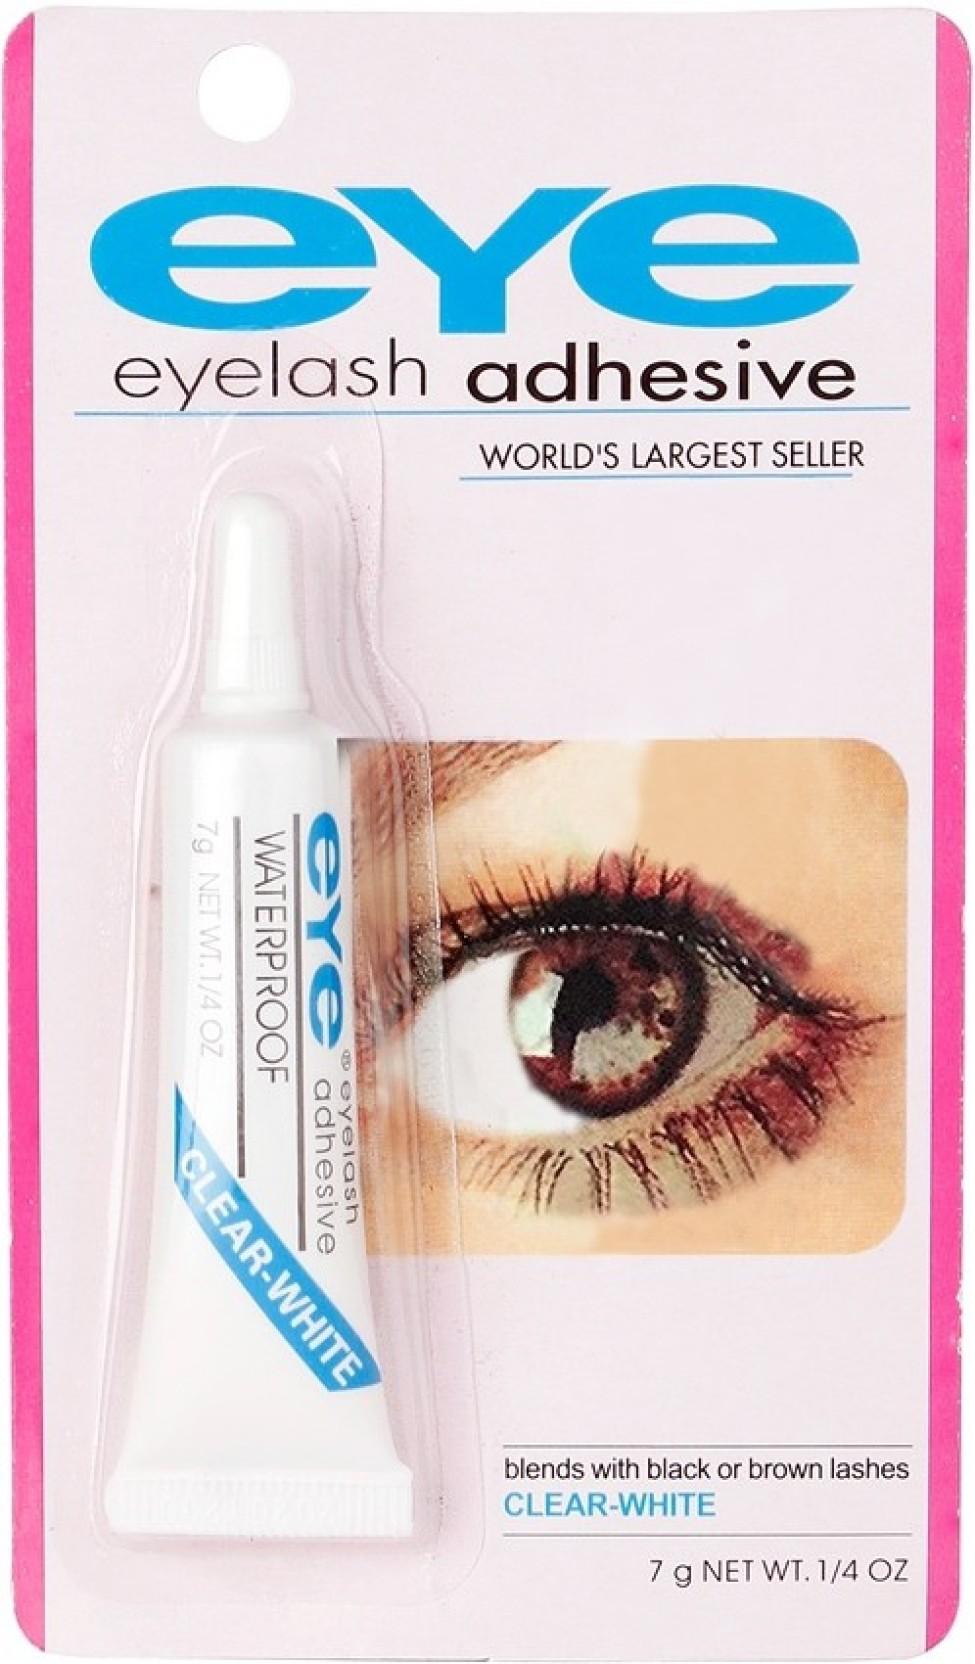 Xccess Waterproof False Eyelashes Makeup Adhesive Eye Lash Glue